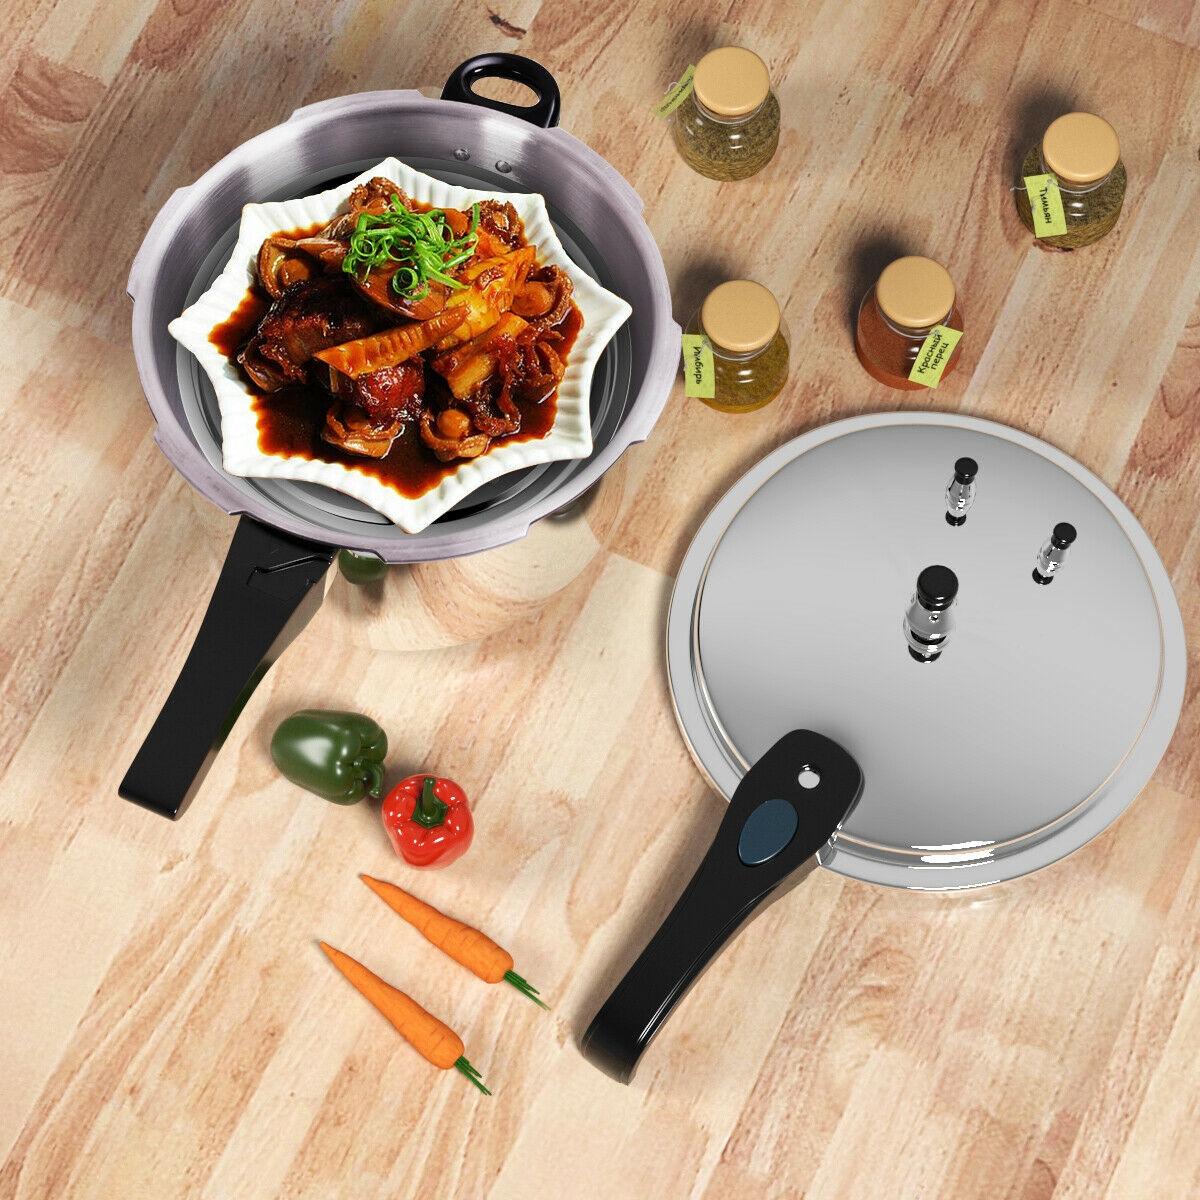 6-Quart Aluminum Pressure Cooker Fast Cooker Cookware